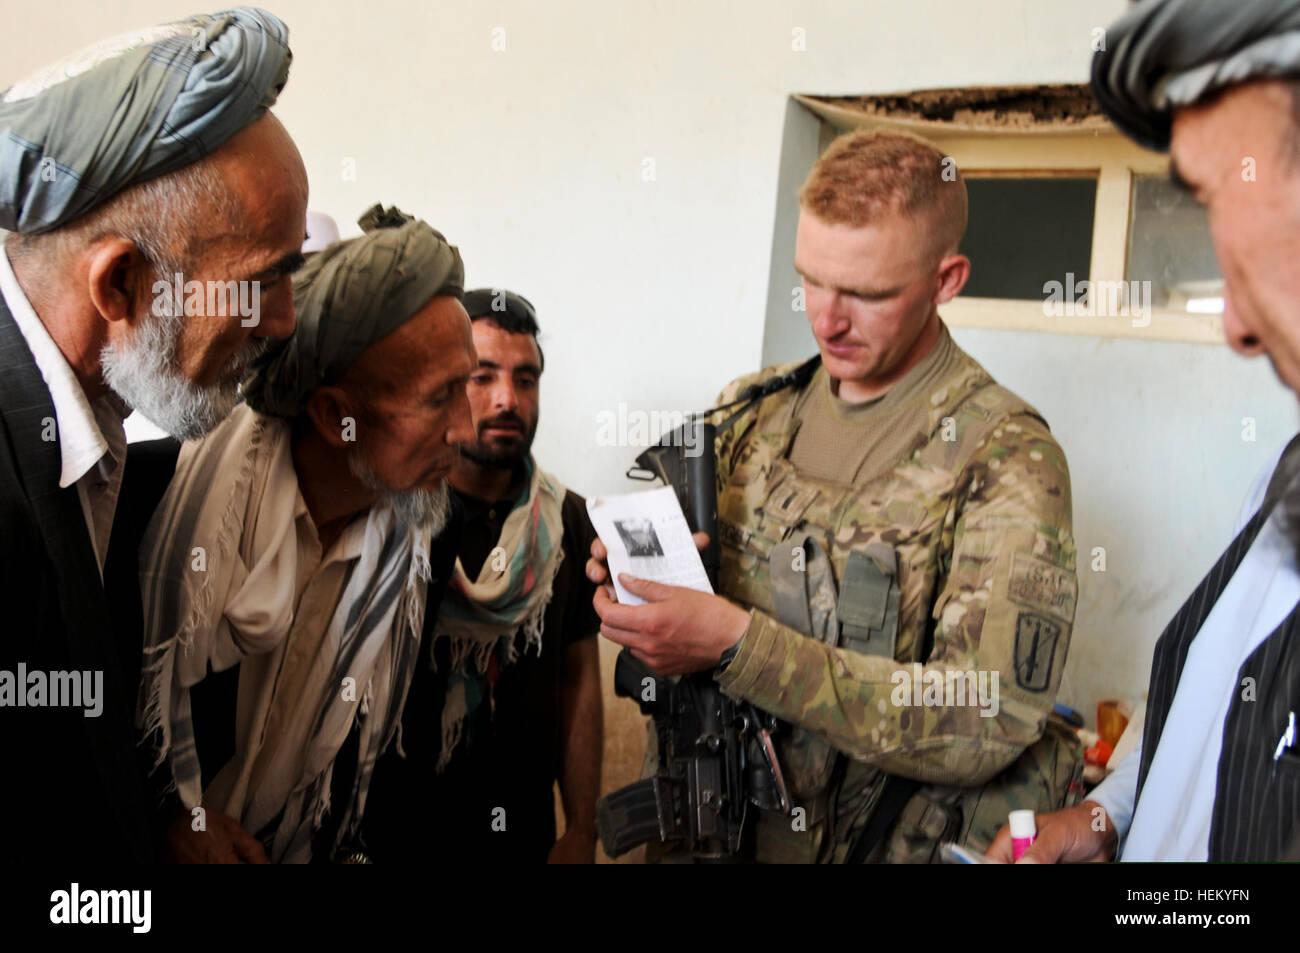 Us Army 1st Lt Zachary Weigelt A Missouri Valley Iowa Native